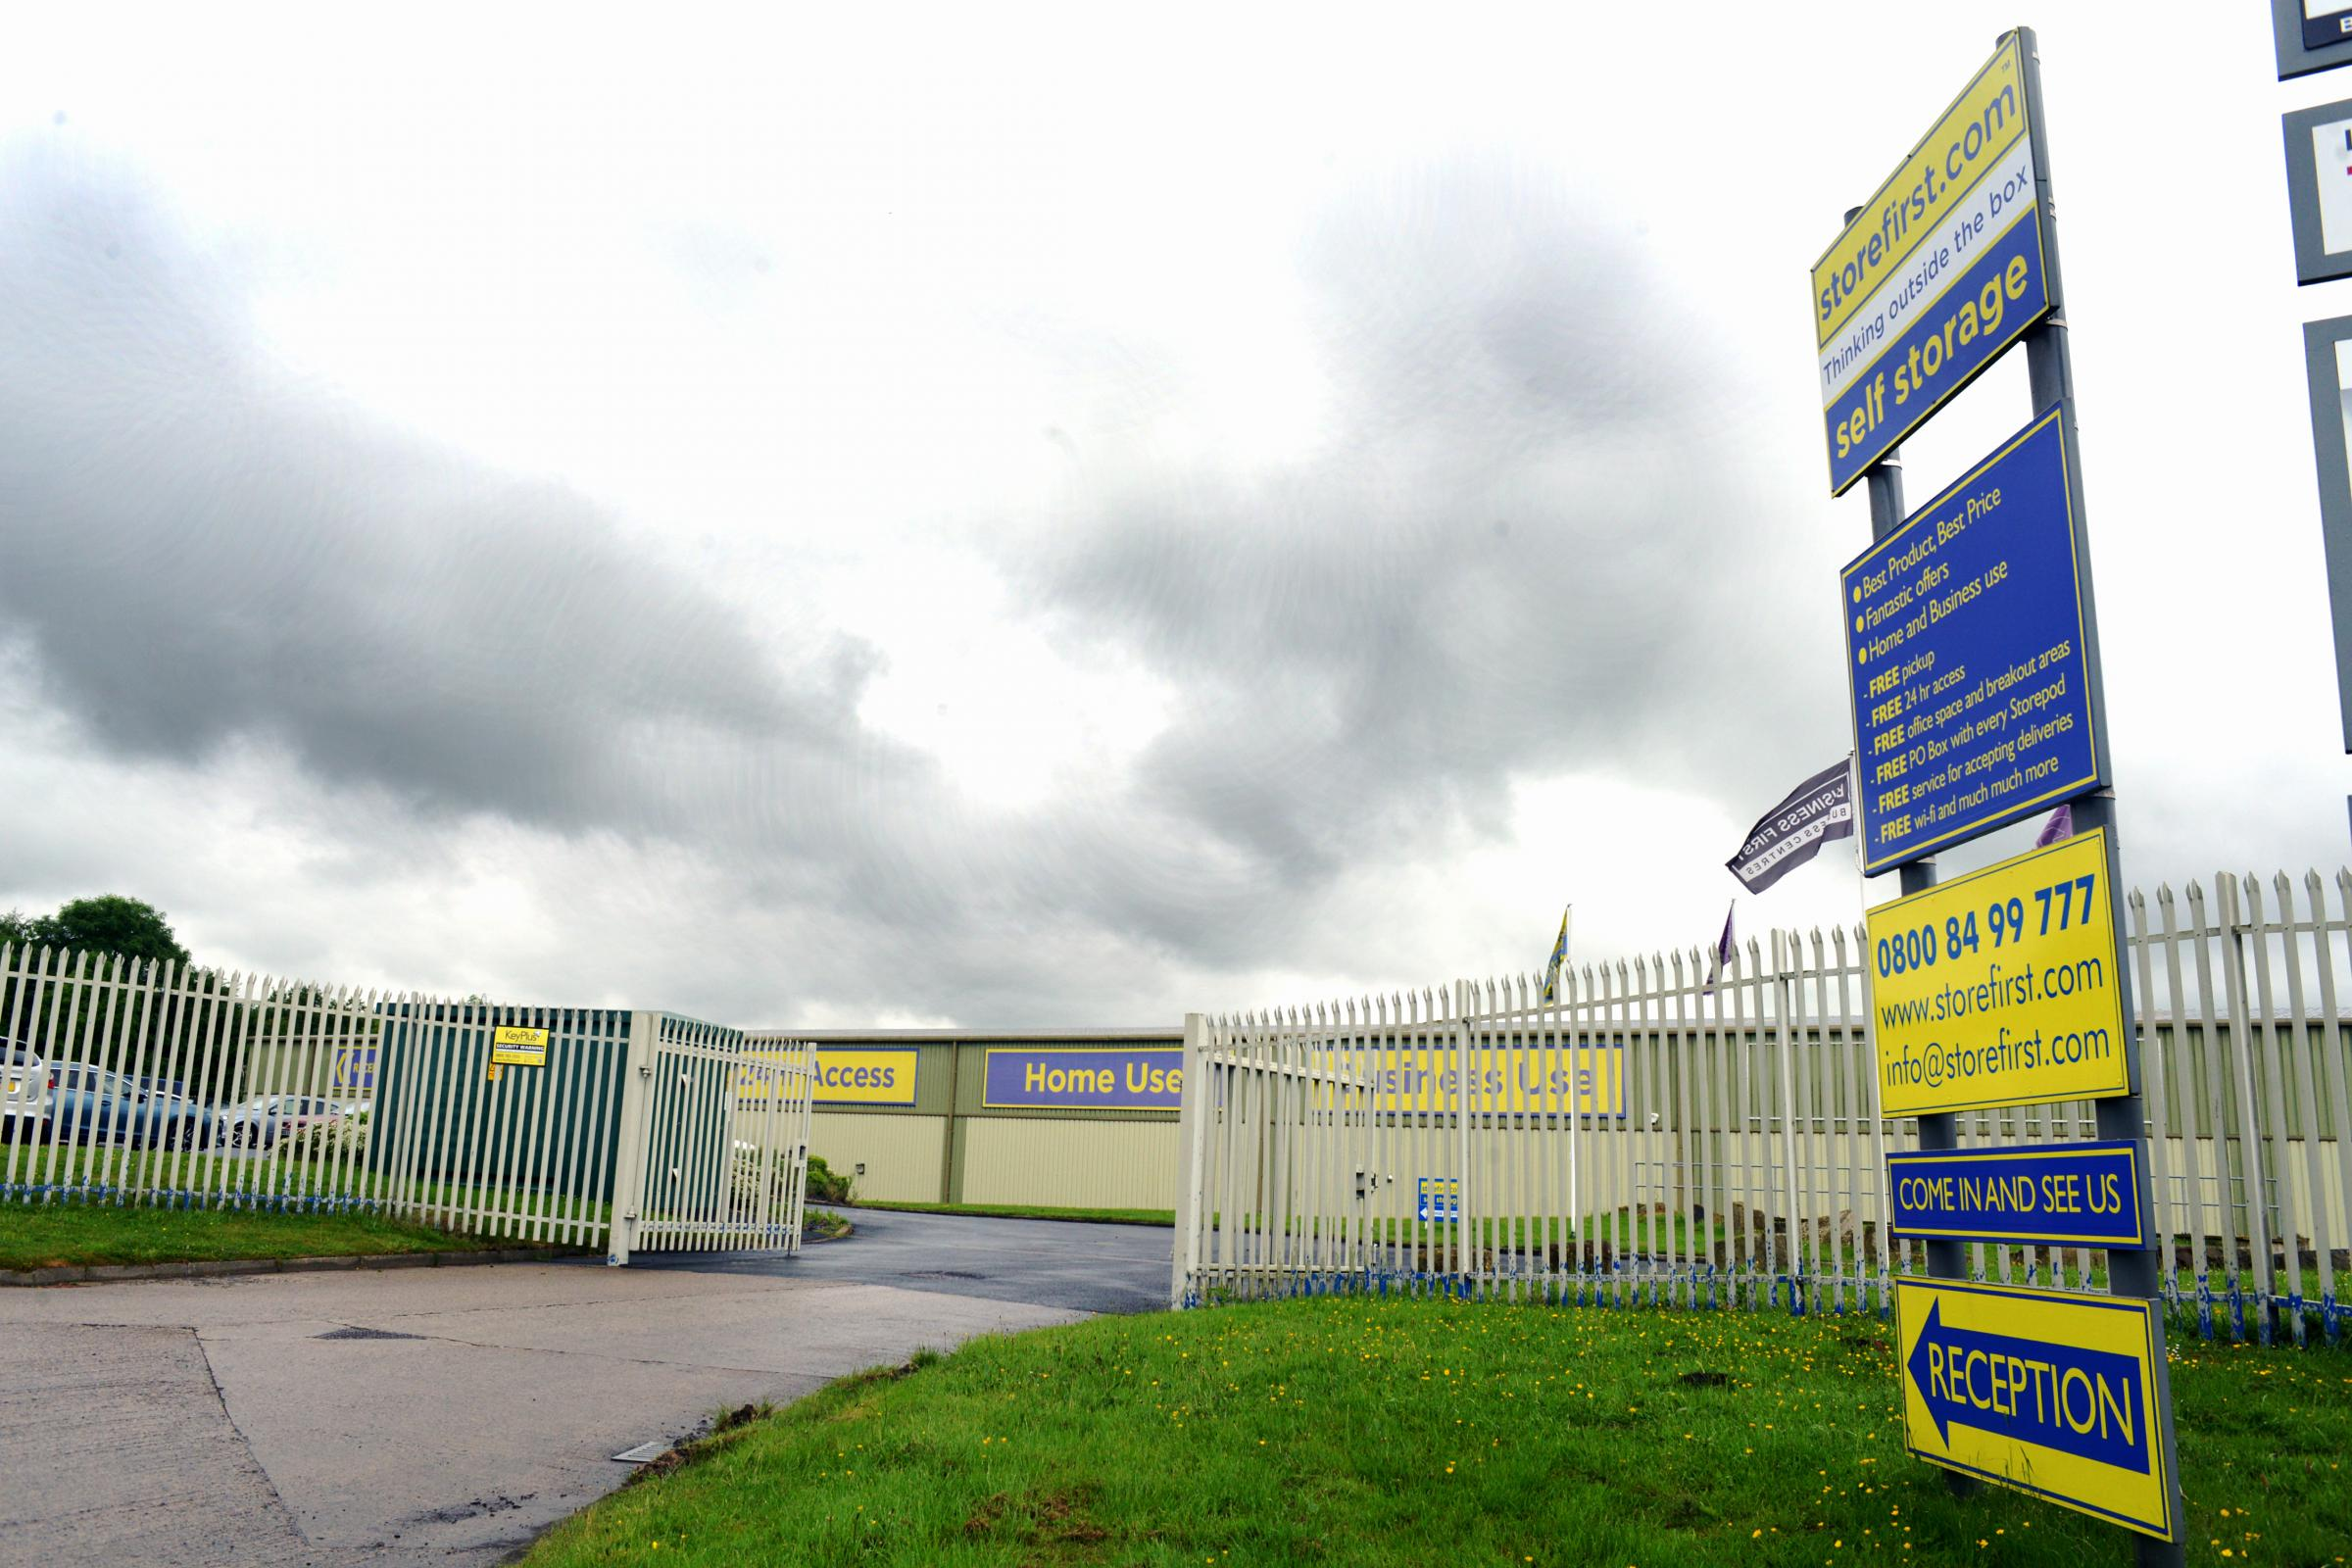 Battle Commences Over Toby Whittakeru0027s £200m East Lancs Storage Pod Empire